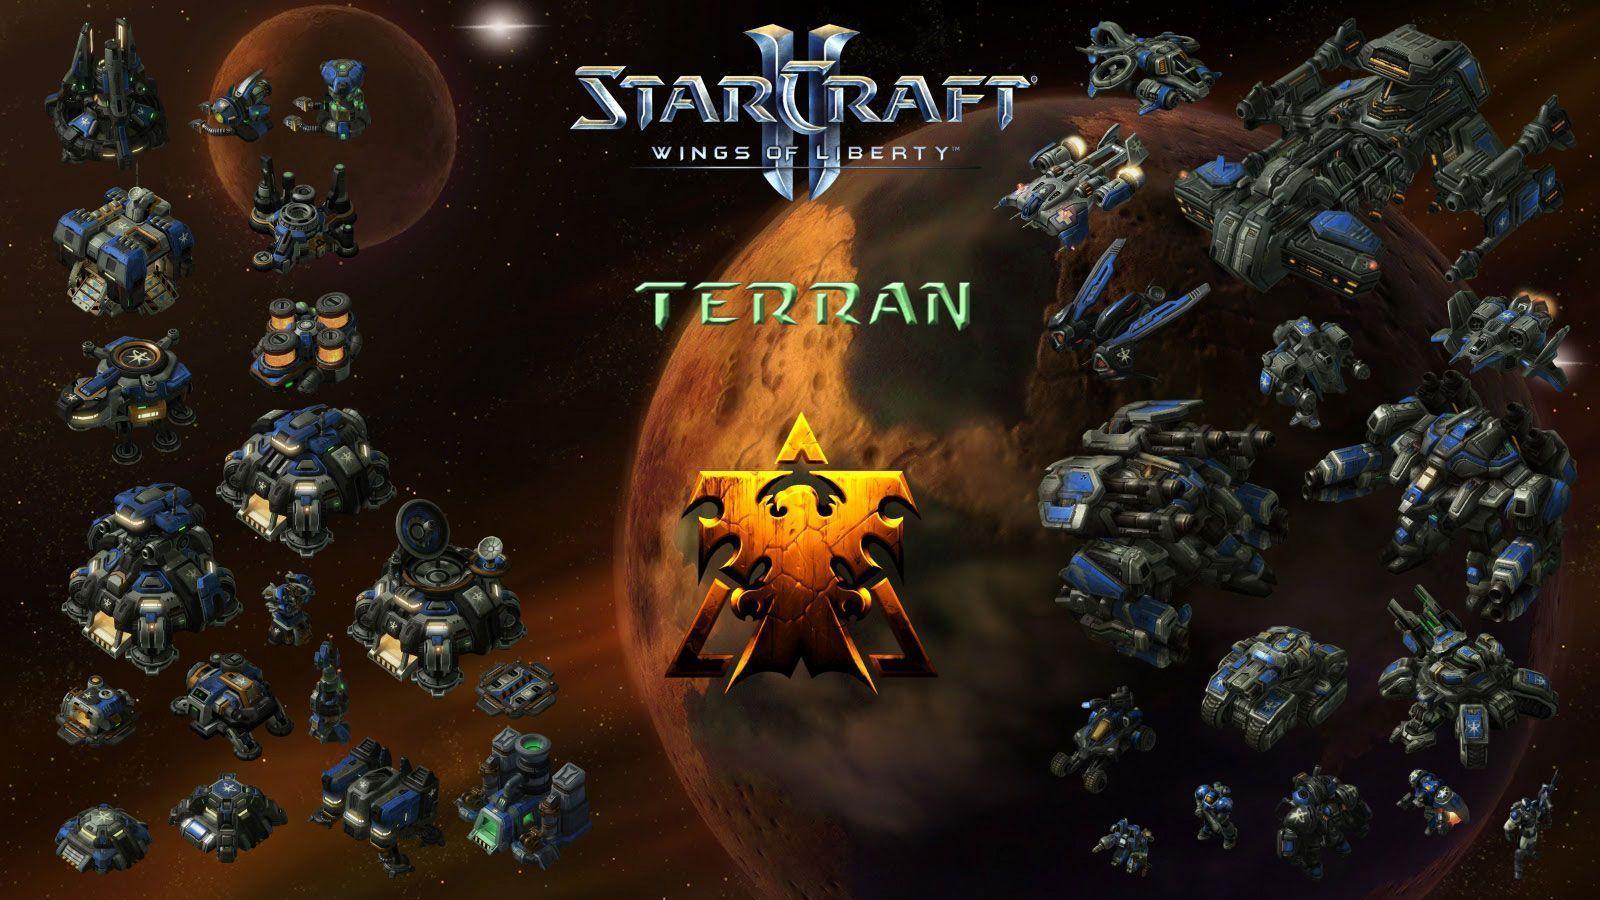 starcraft ii terran wallpaper - photo #7